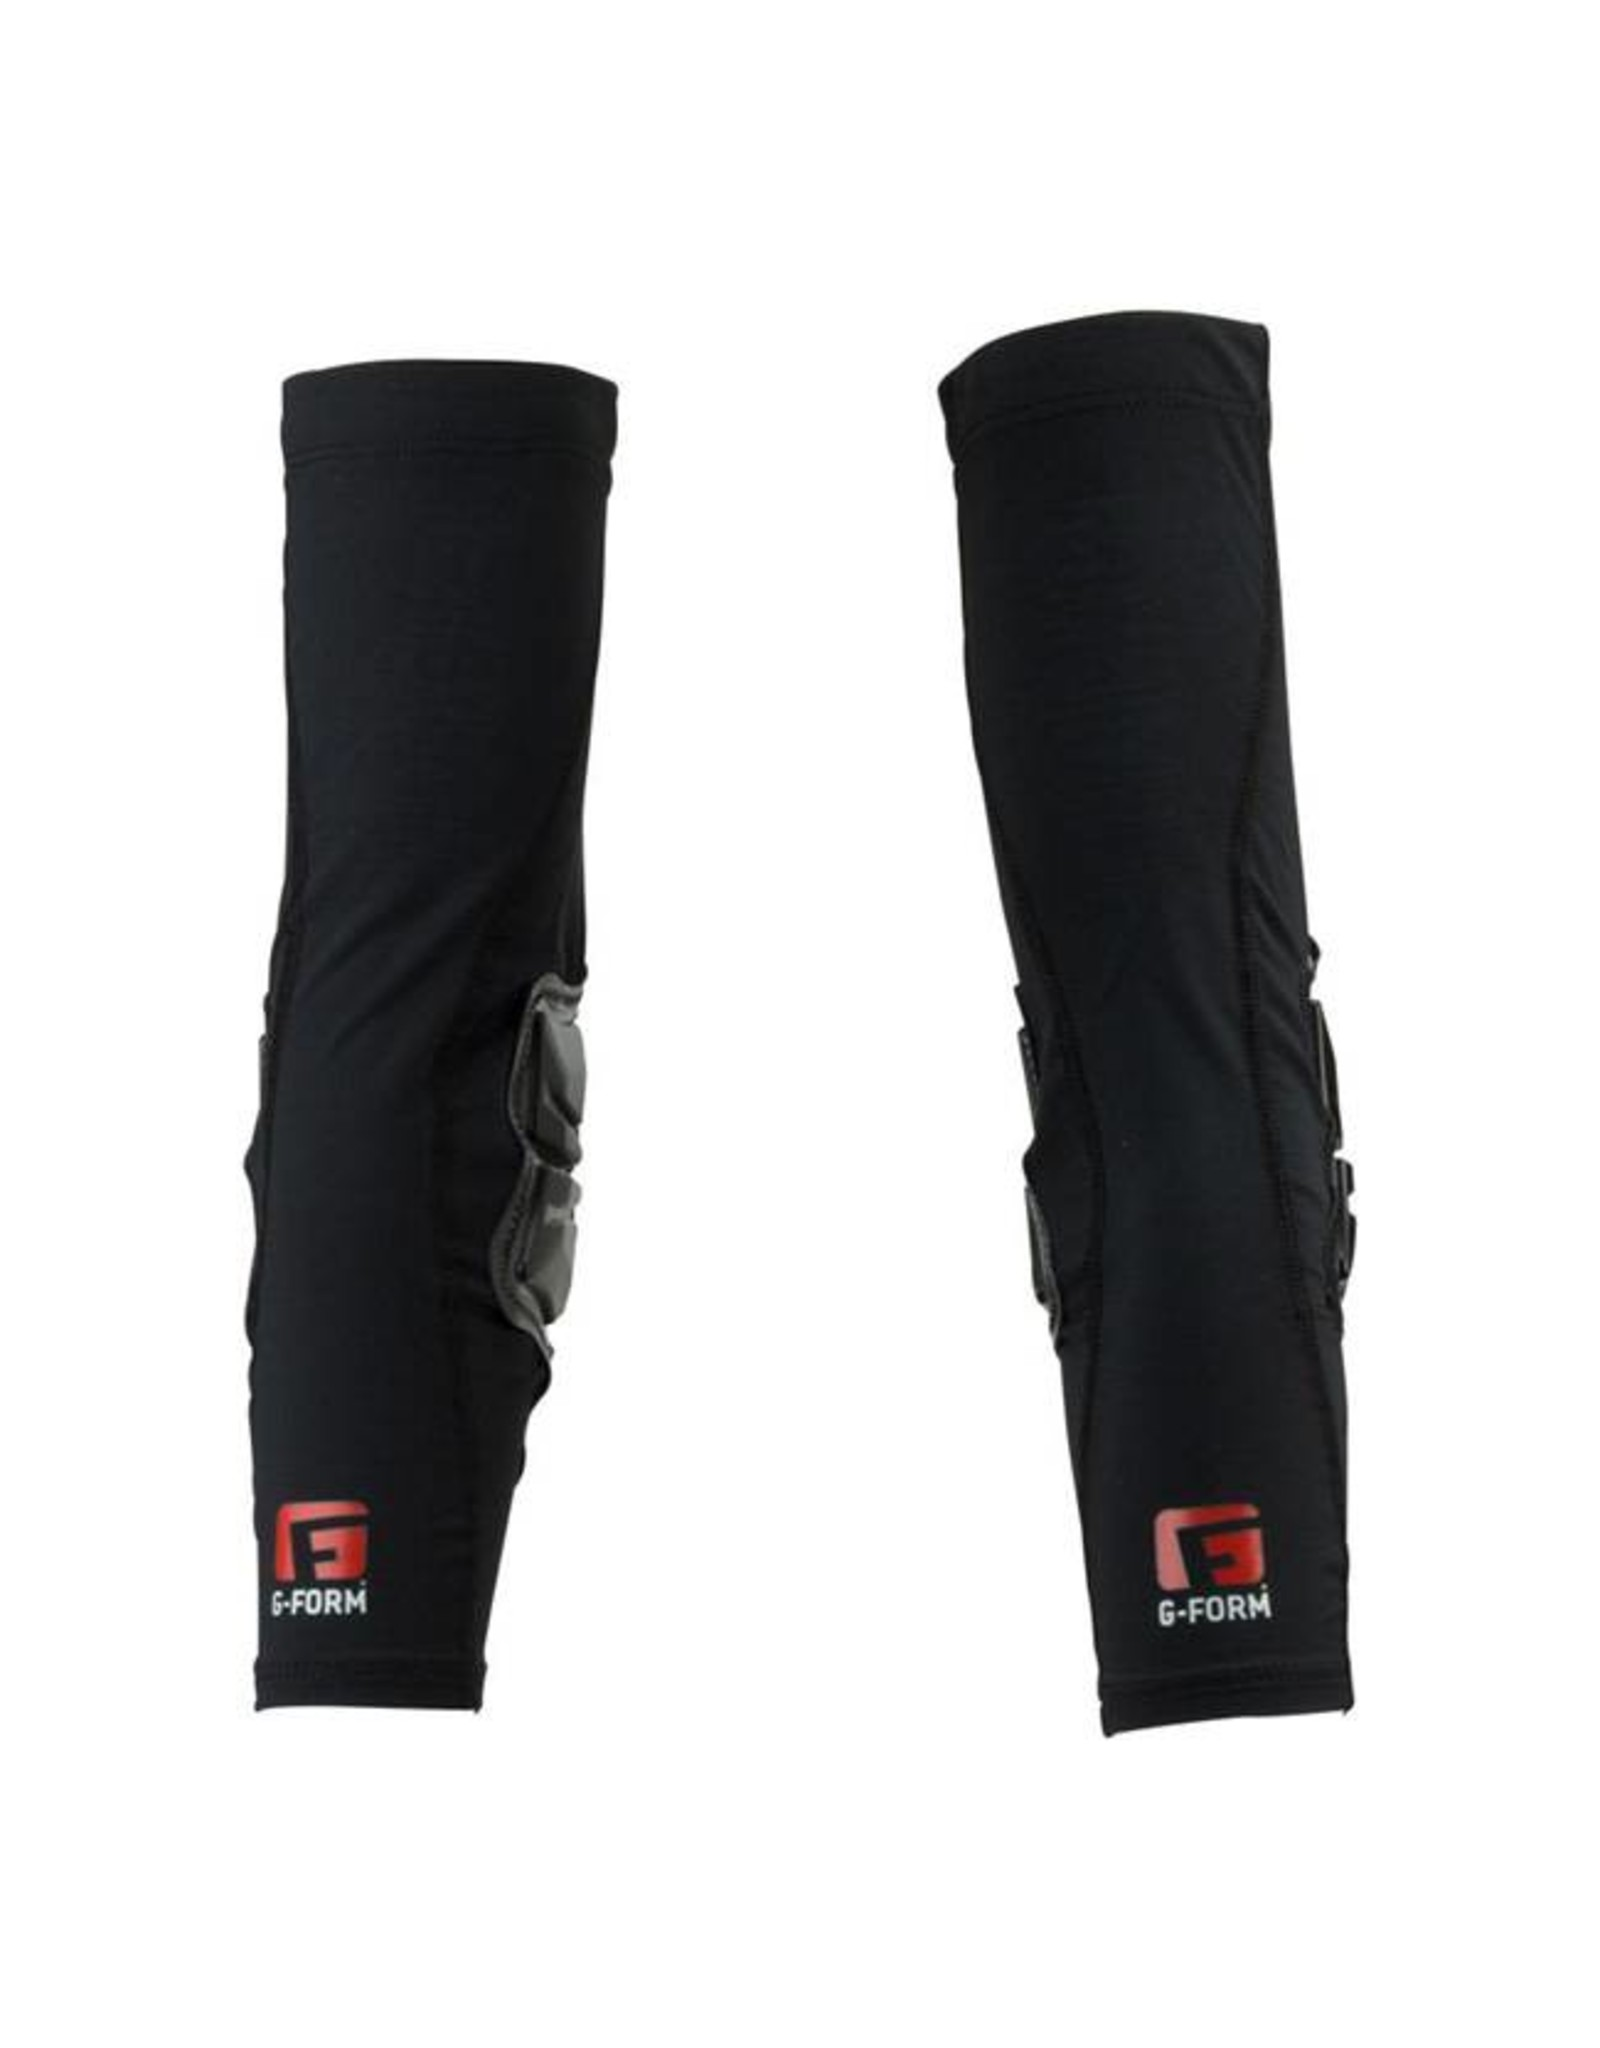 G-Form G-Form Pro-X Elbow Pad: Black, LG